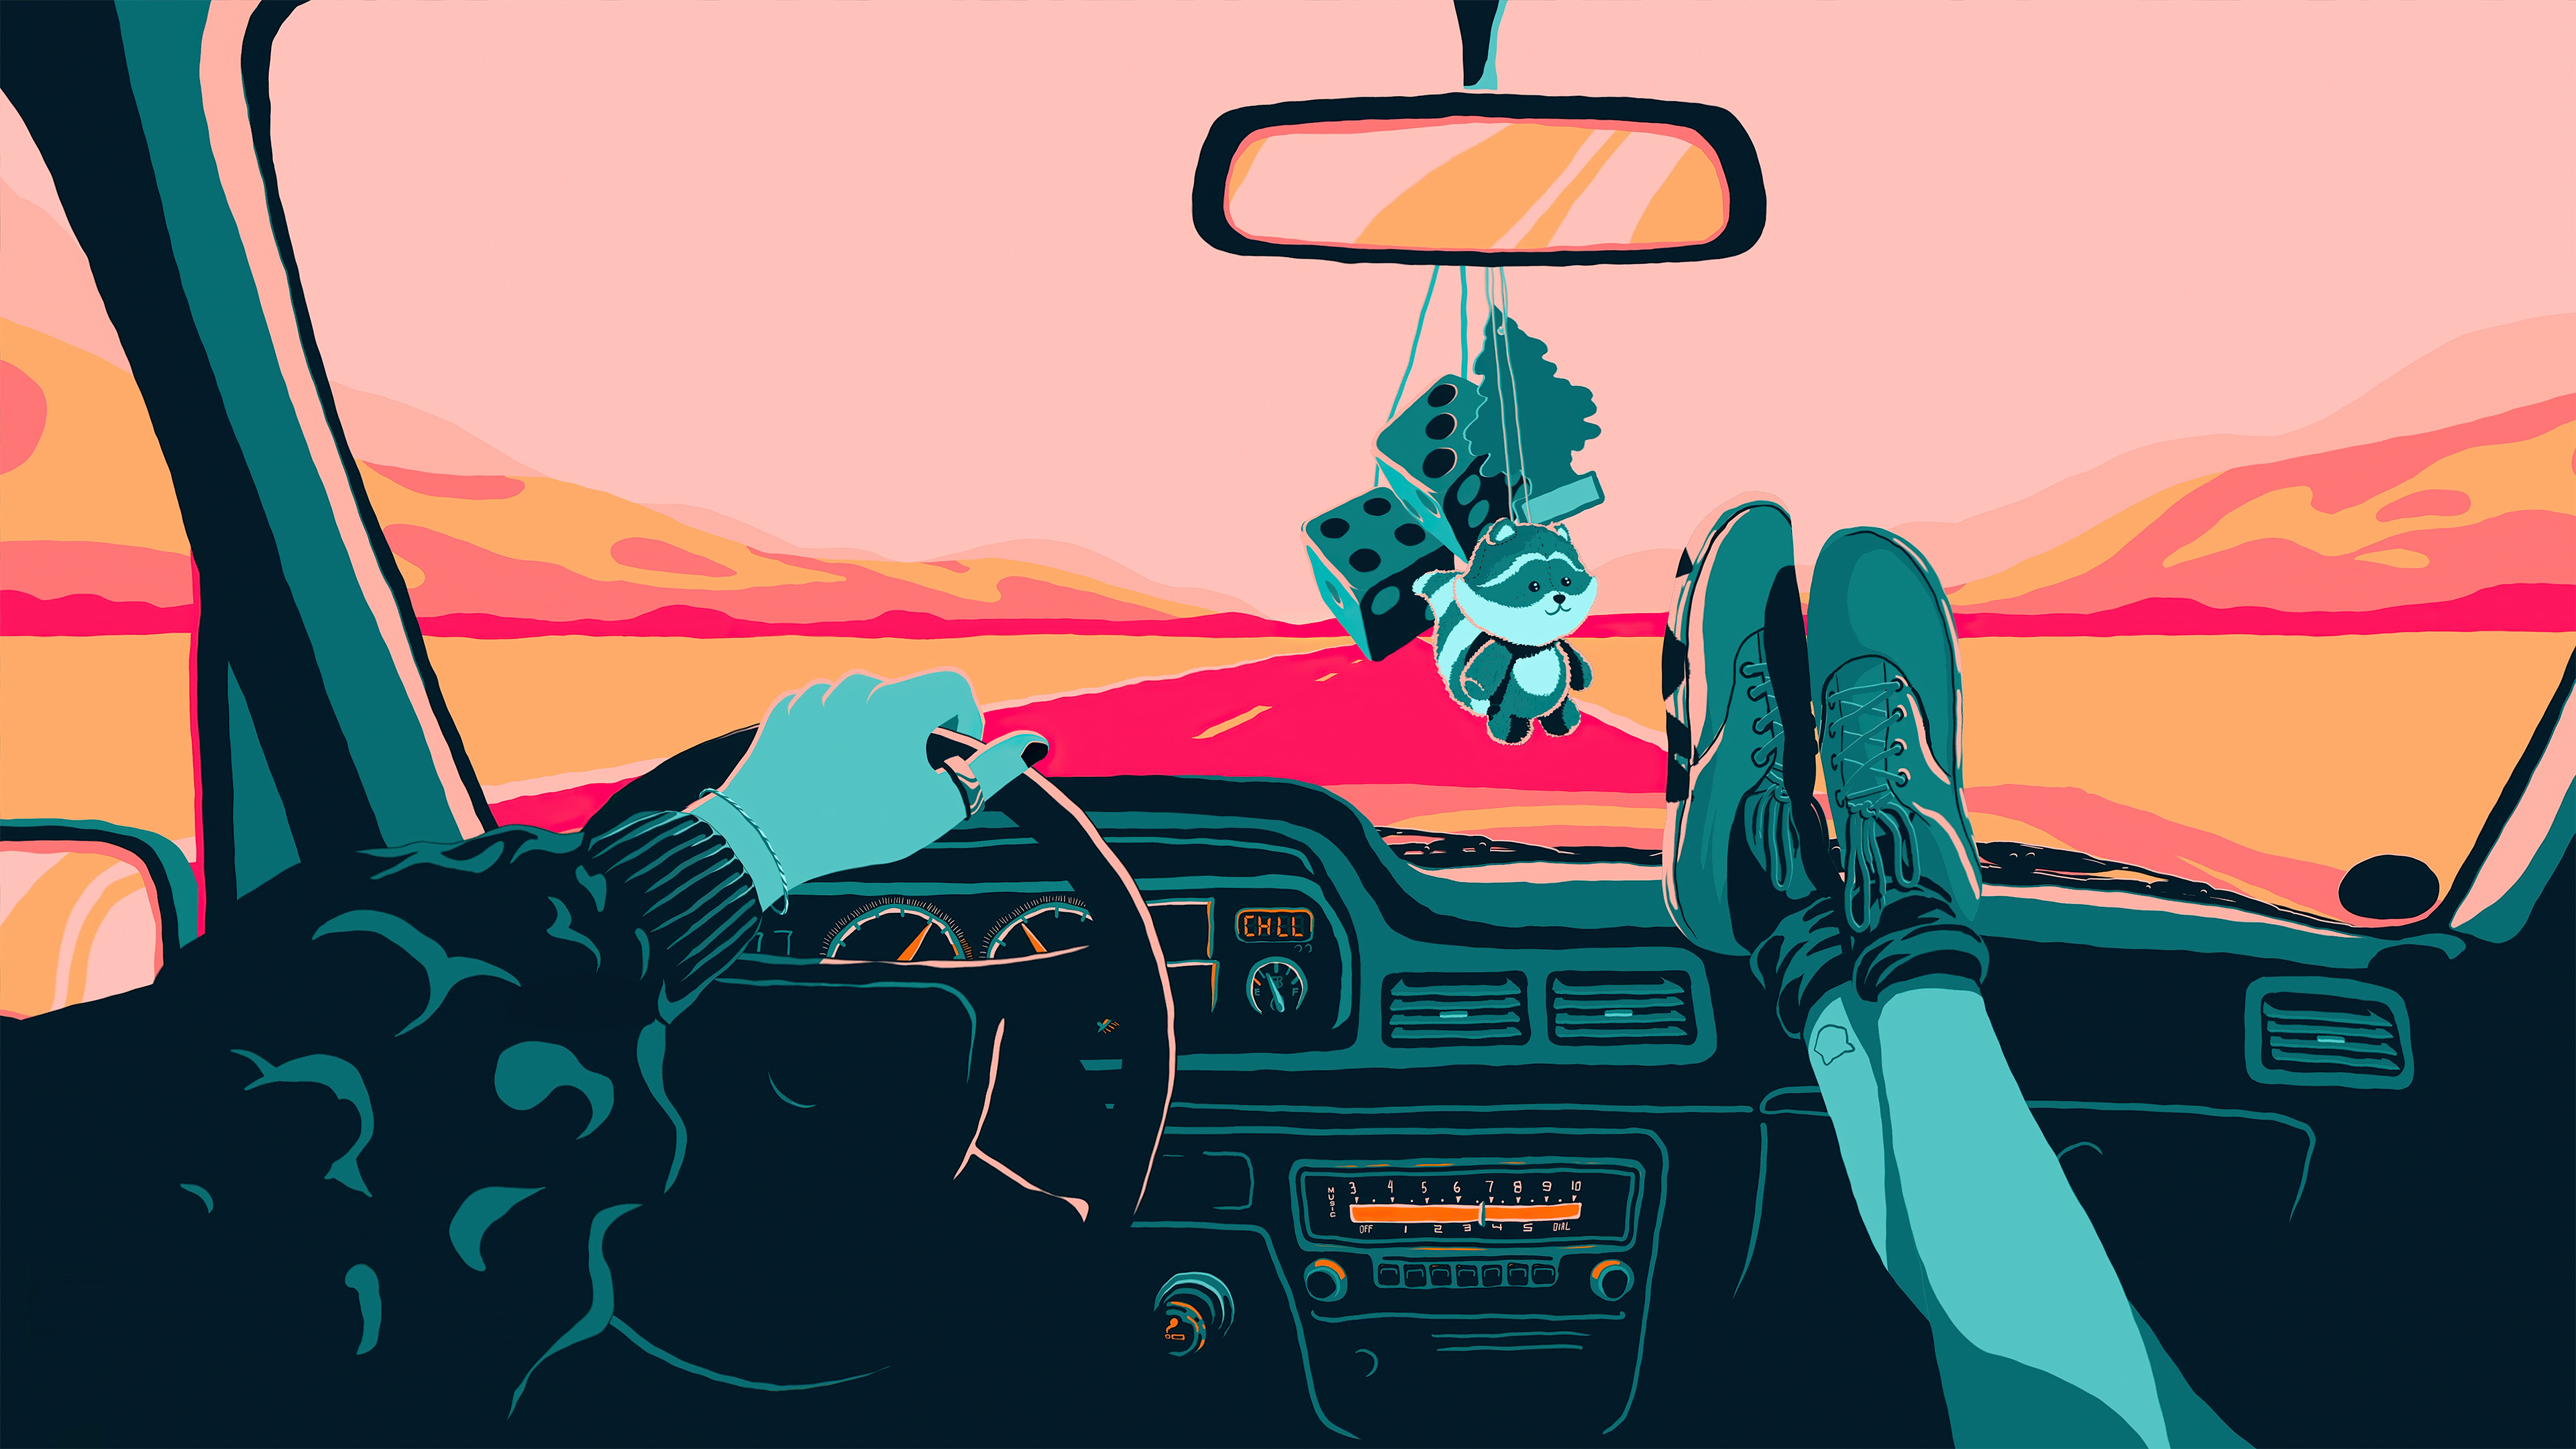 Fondos de pantalla Viaje en carretera